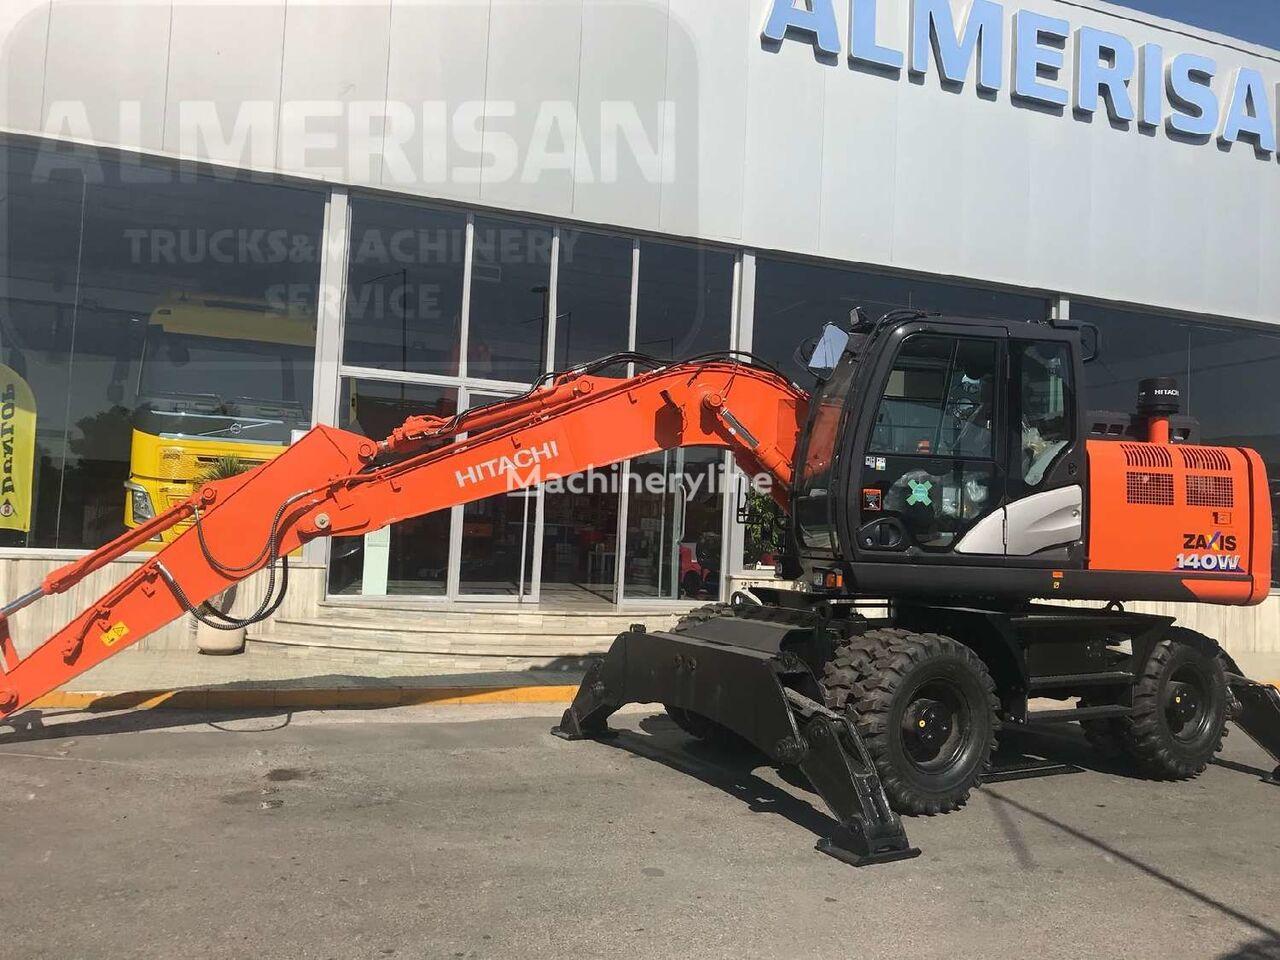 excavadora de ruedas HITACHI ZX 140W-6. EXCAVADORA DE RUEDAS